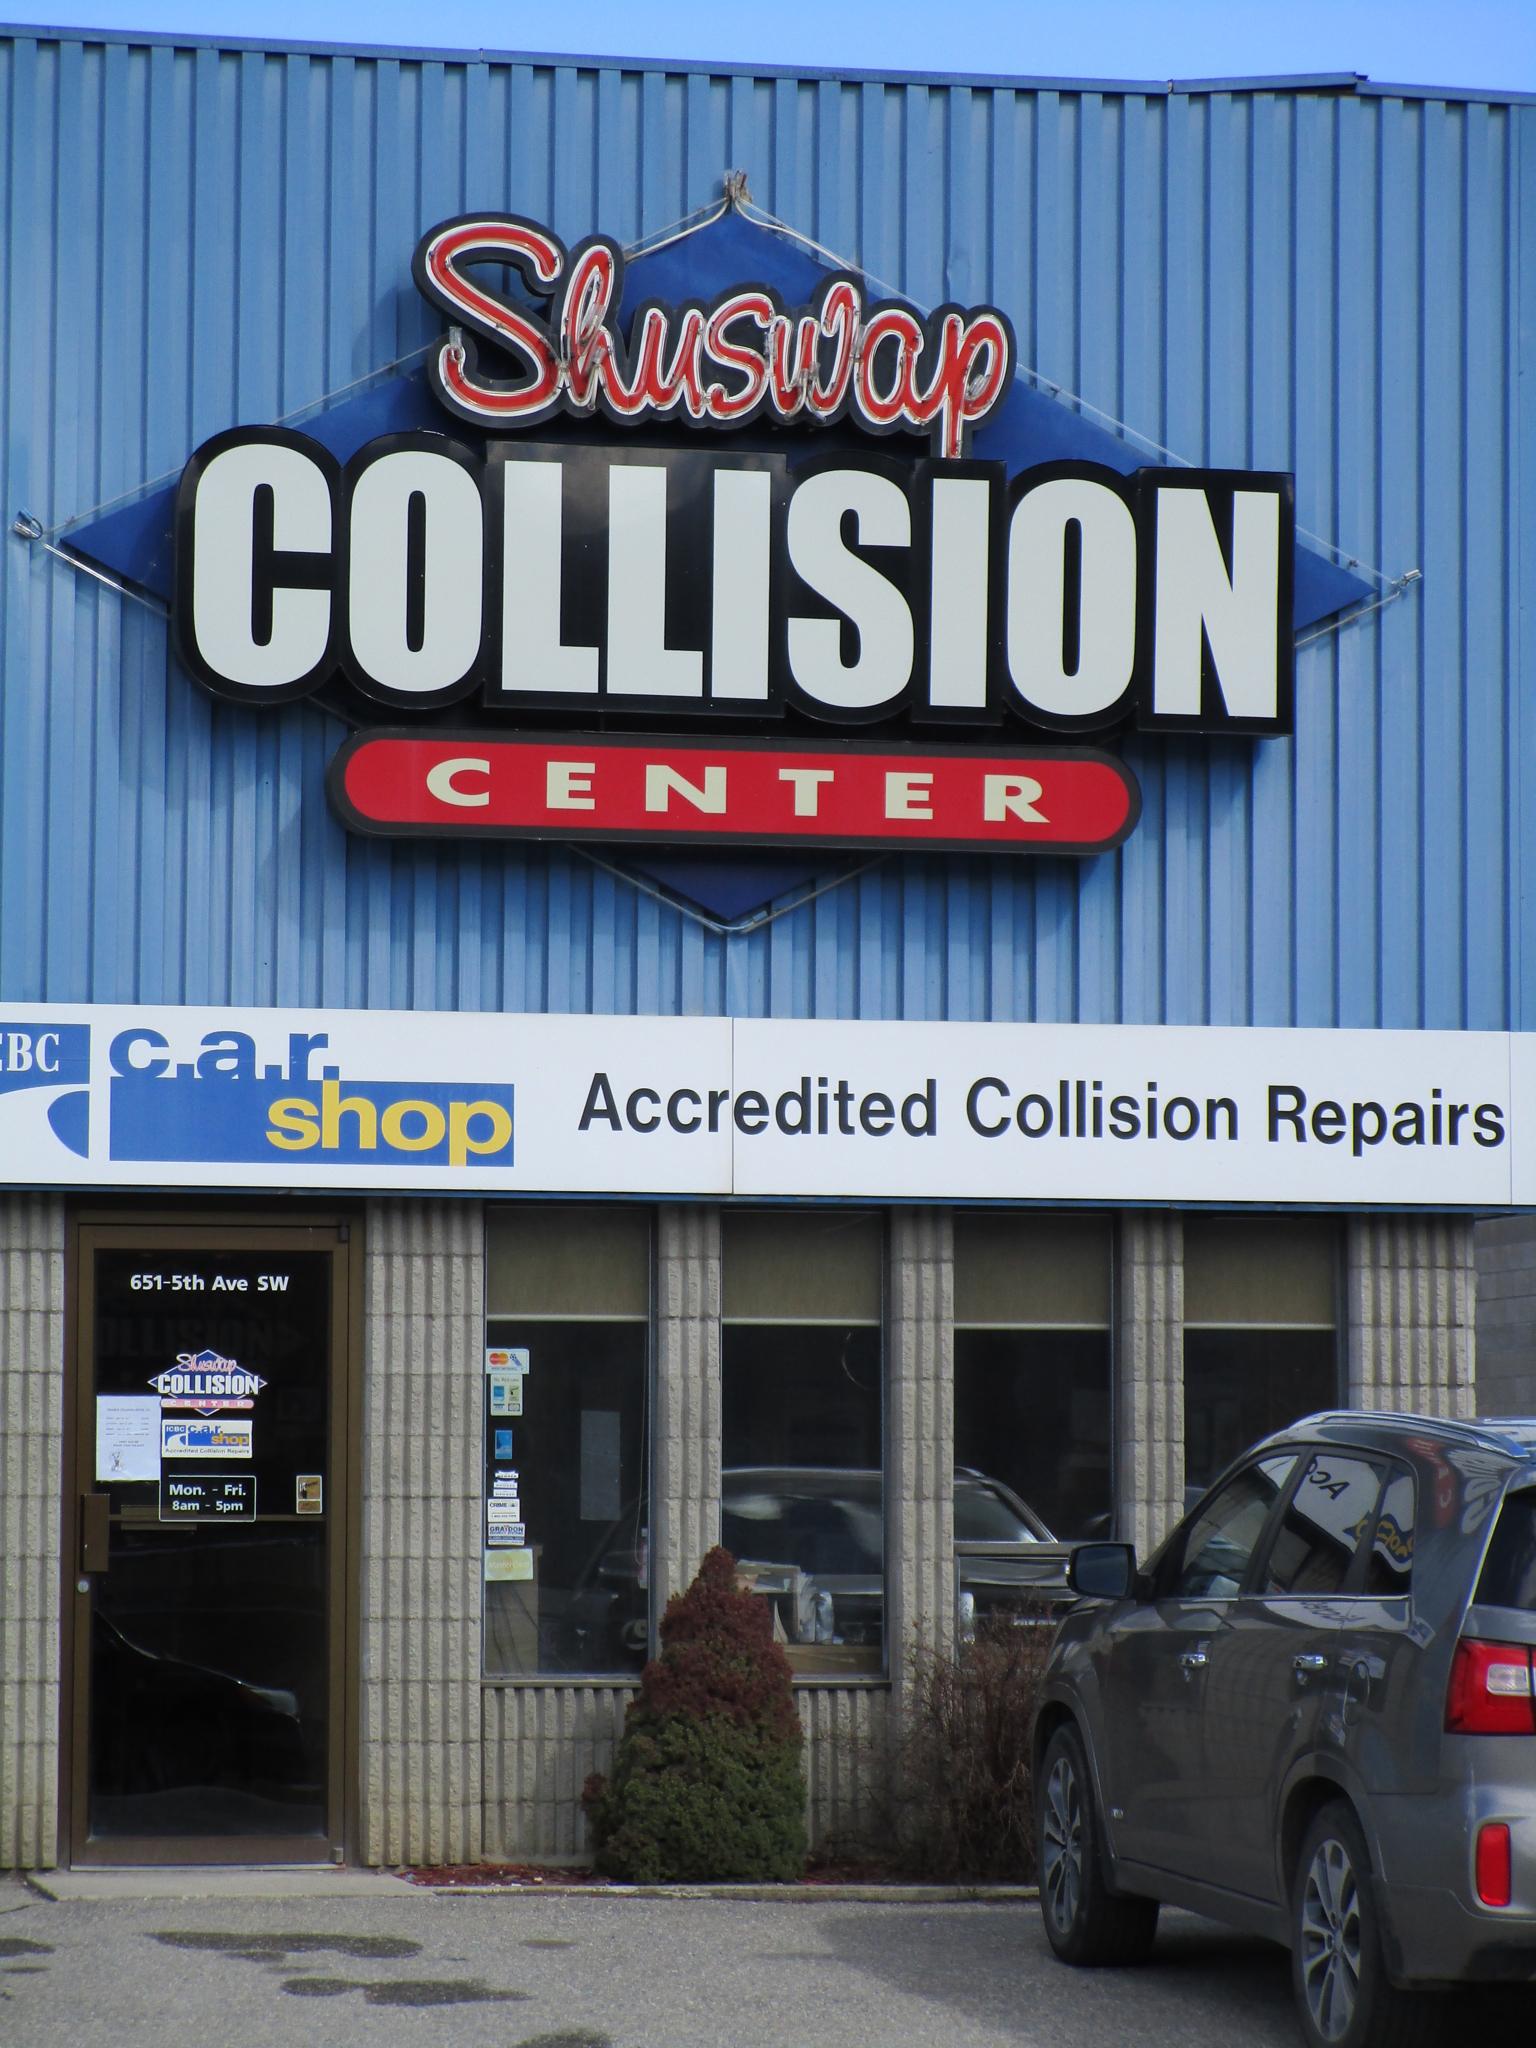 Shuswap Collision Center Ltd in Salmon Arm